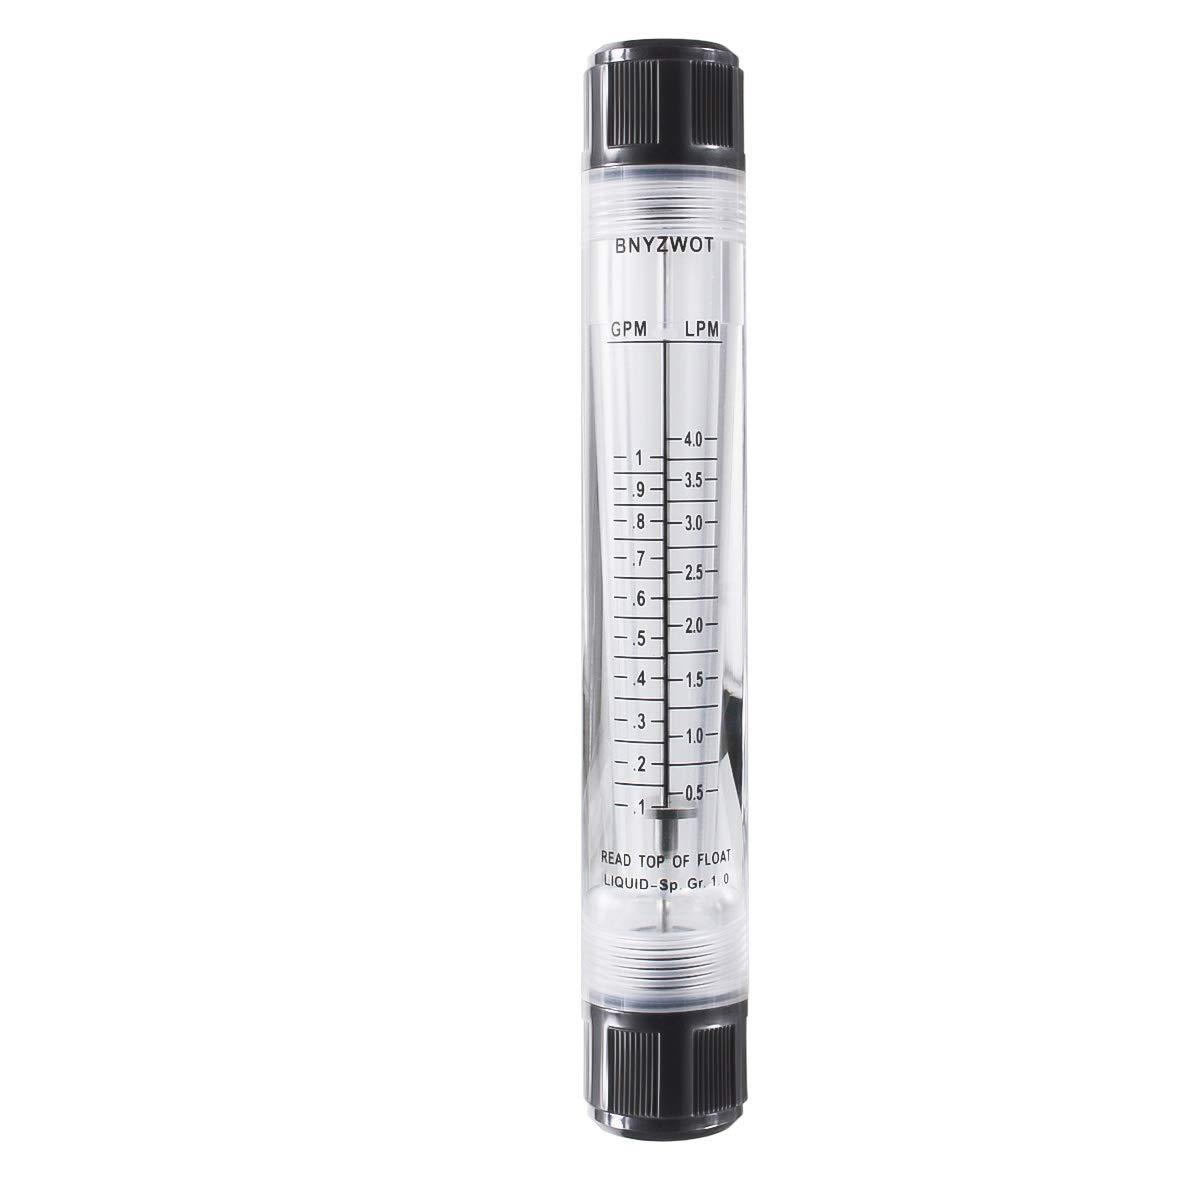 BNYZWOT Water 100% quality warranty! Flow Meter Panel Type Flowmeter 0.5 G-15 GPM 0.1-1 shop